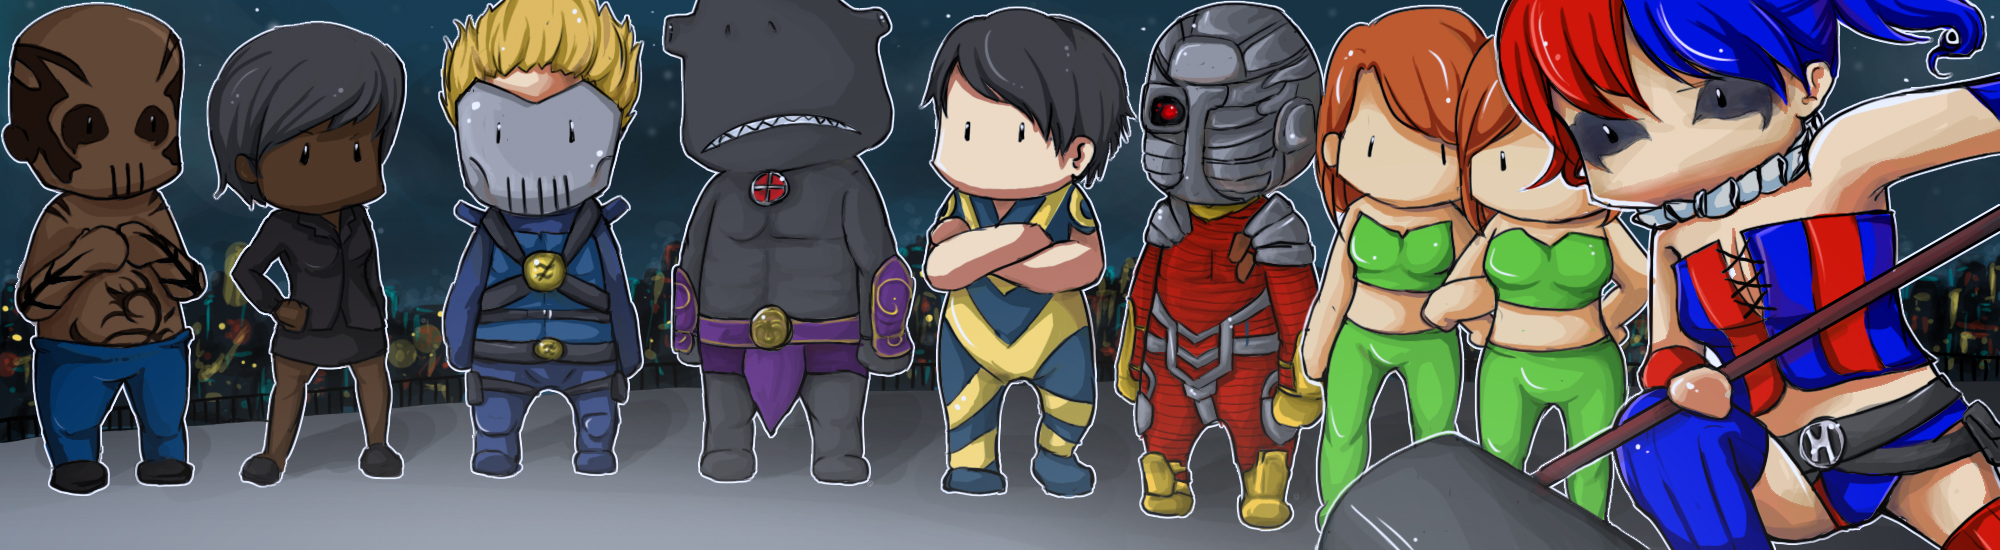 Suicide Squad by frilla